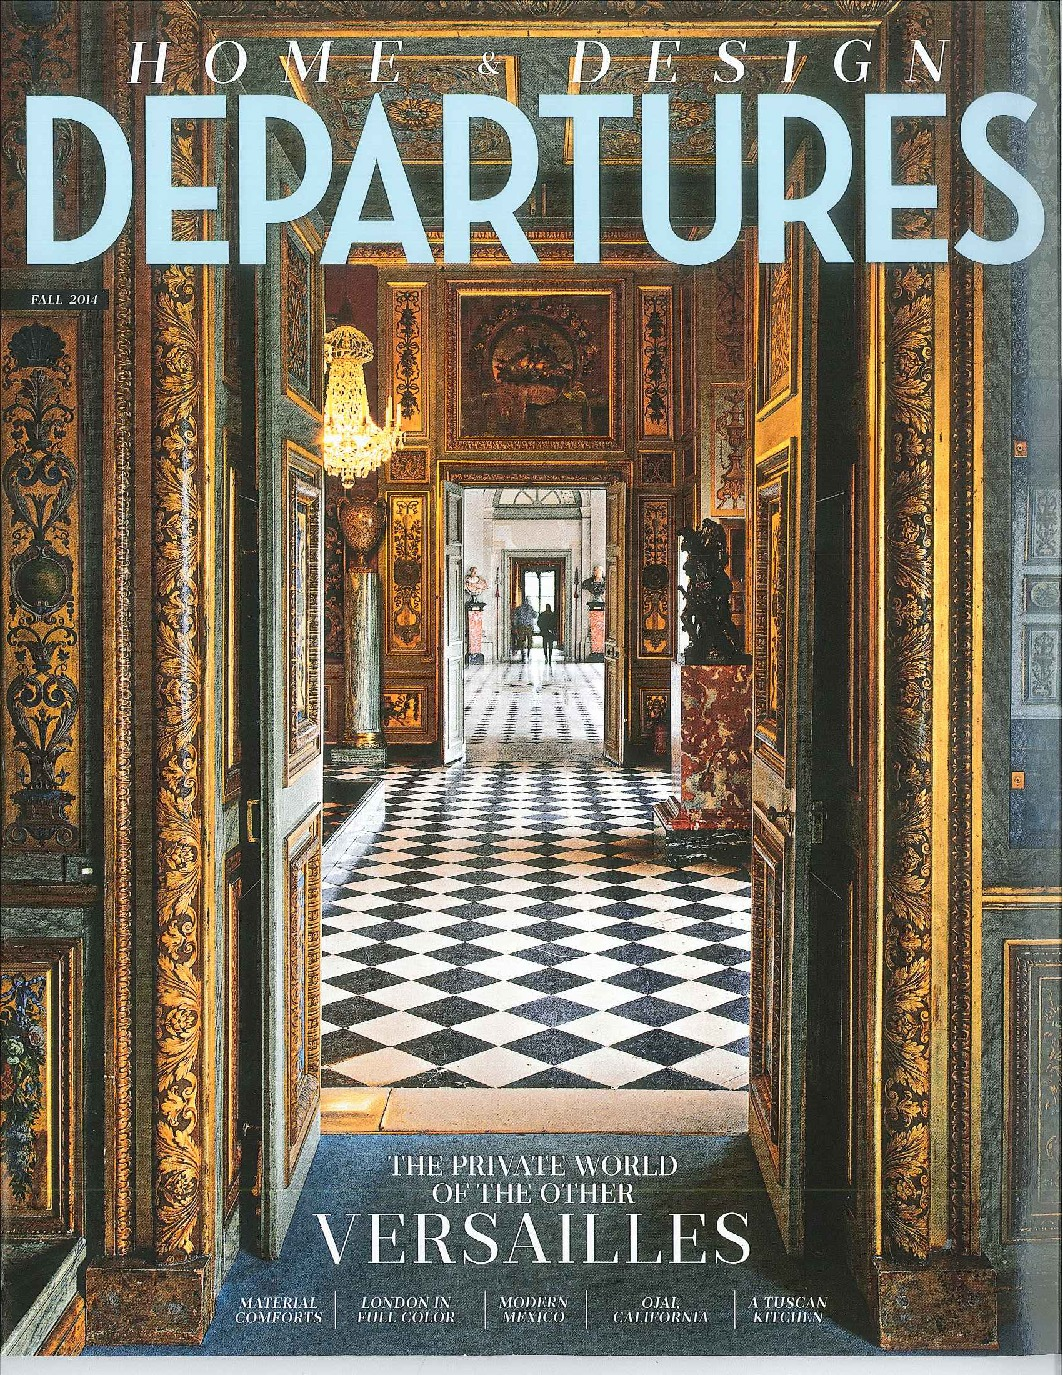 USA_Departures_Home_Design_Oct_14-0